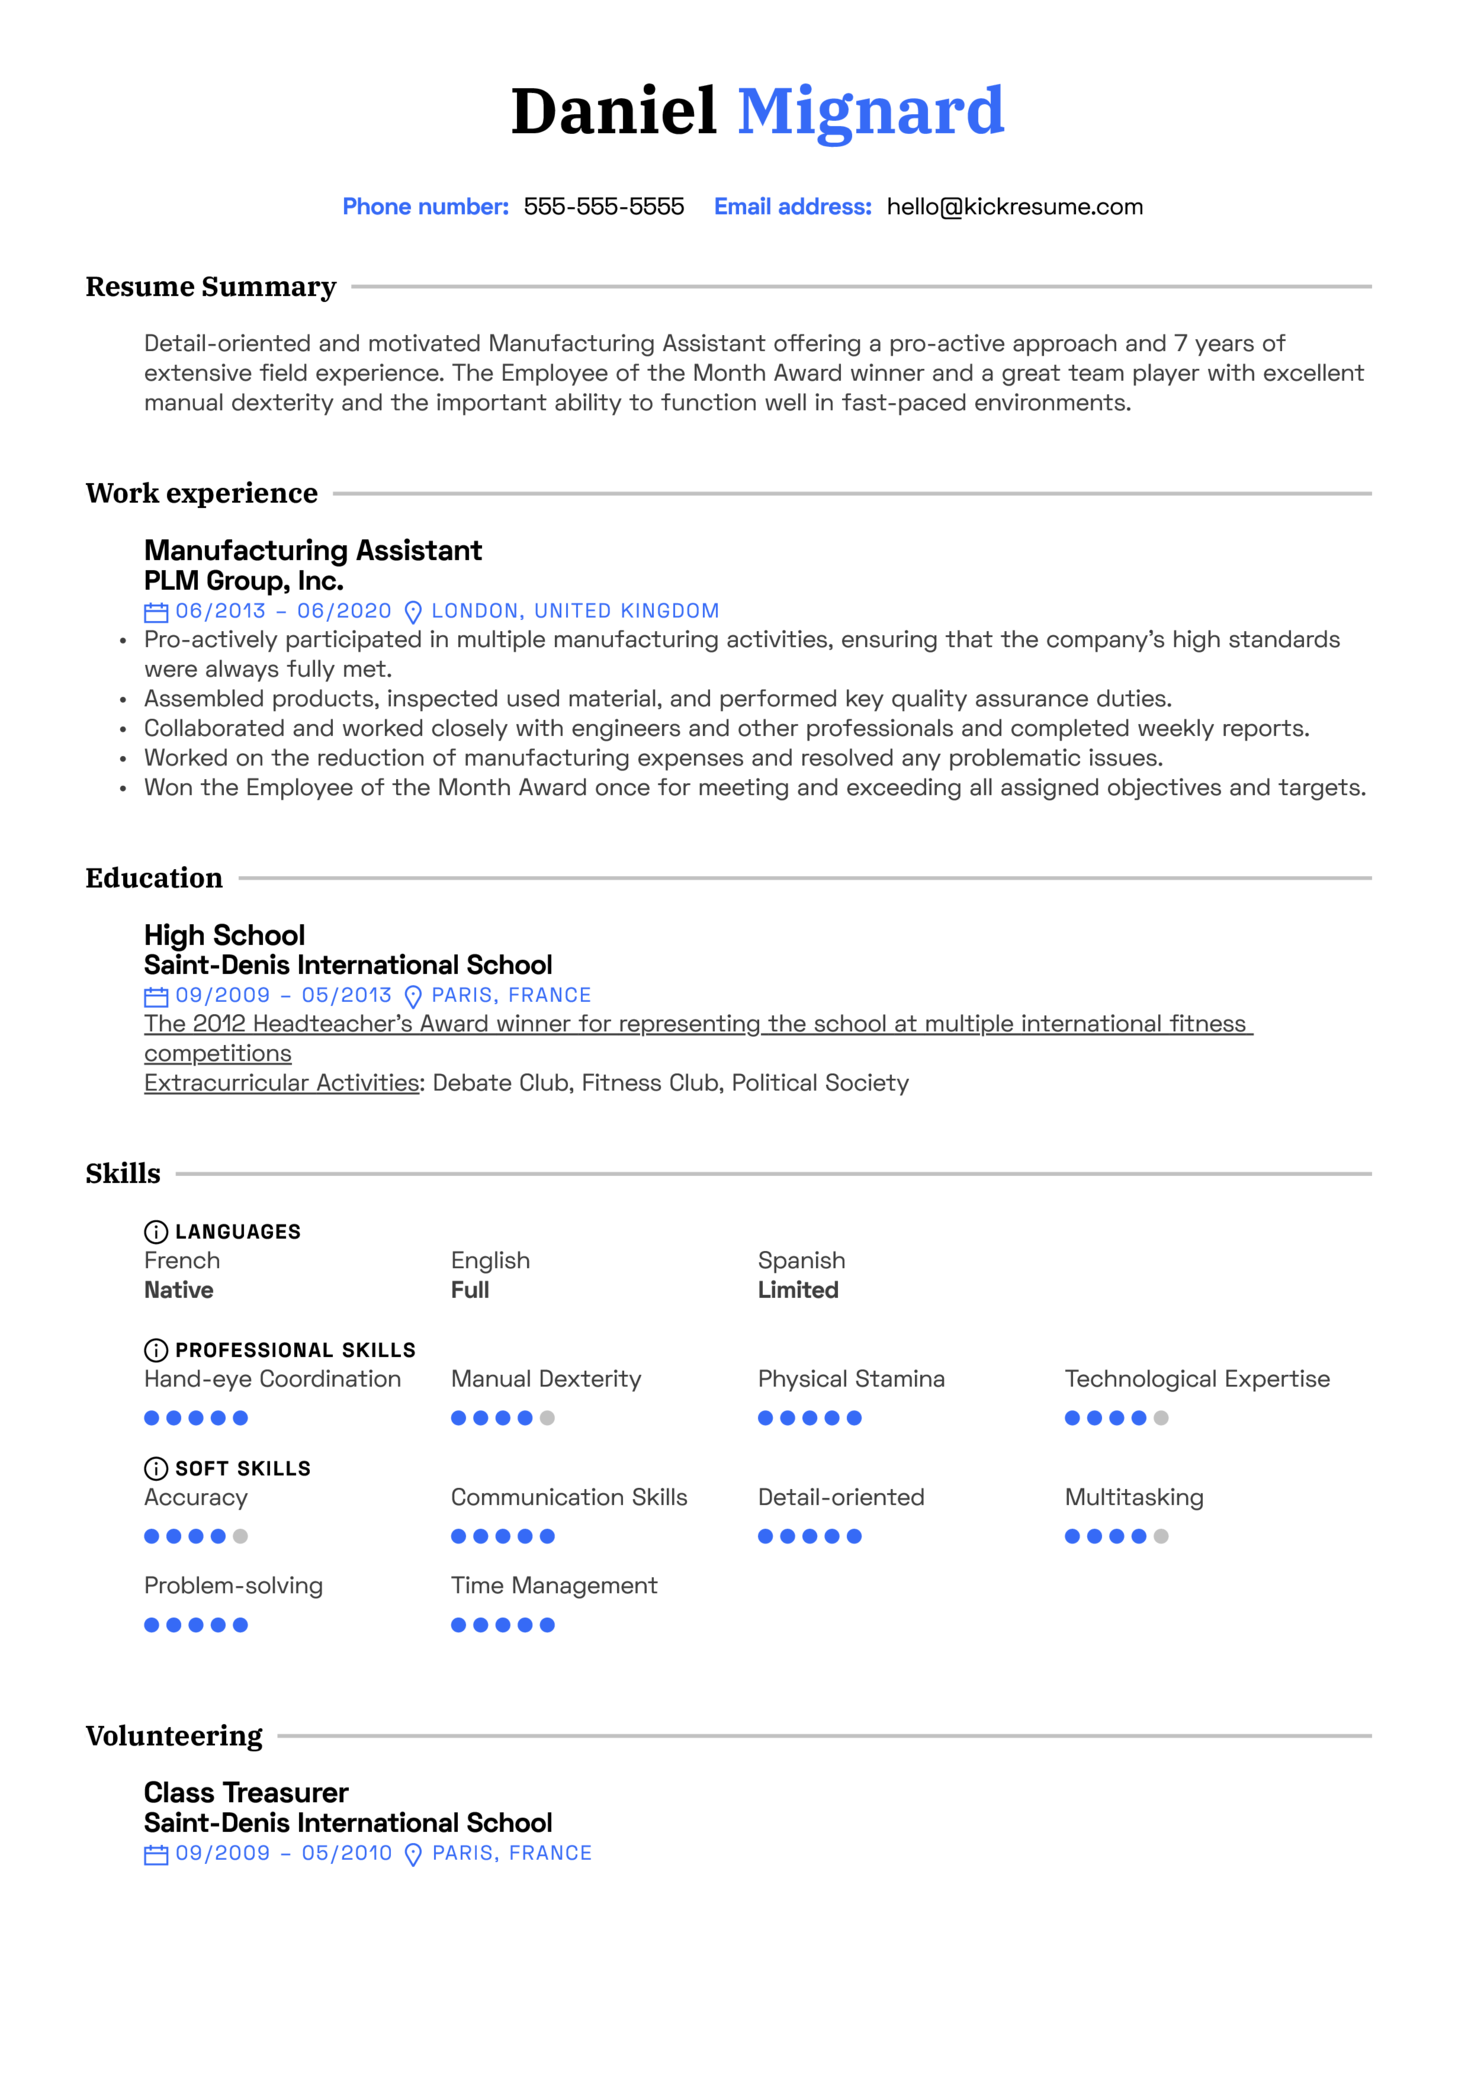 Manufacturing Assistant Resume Sample (parte 1)